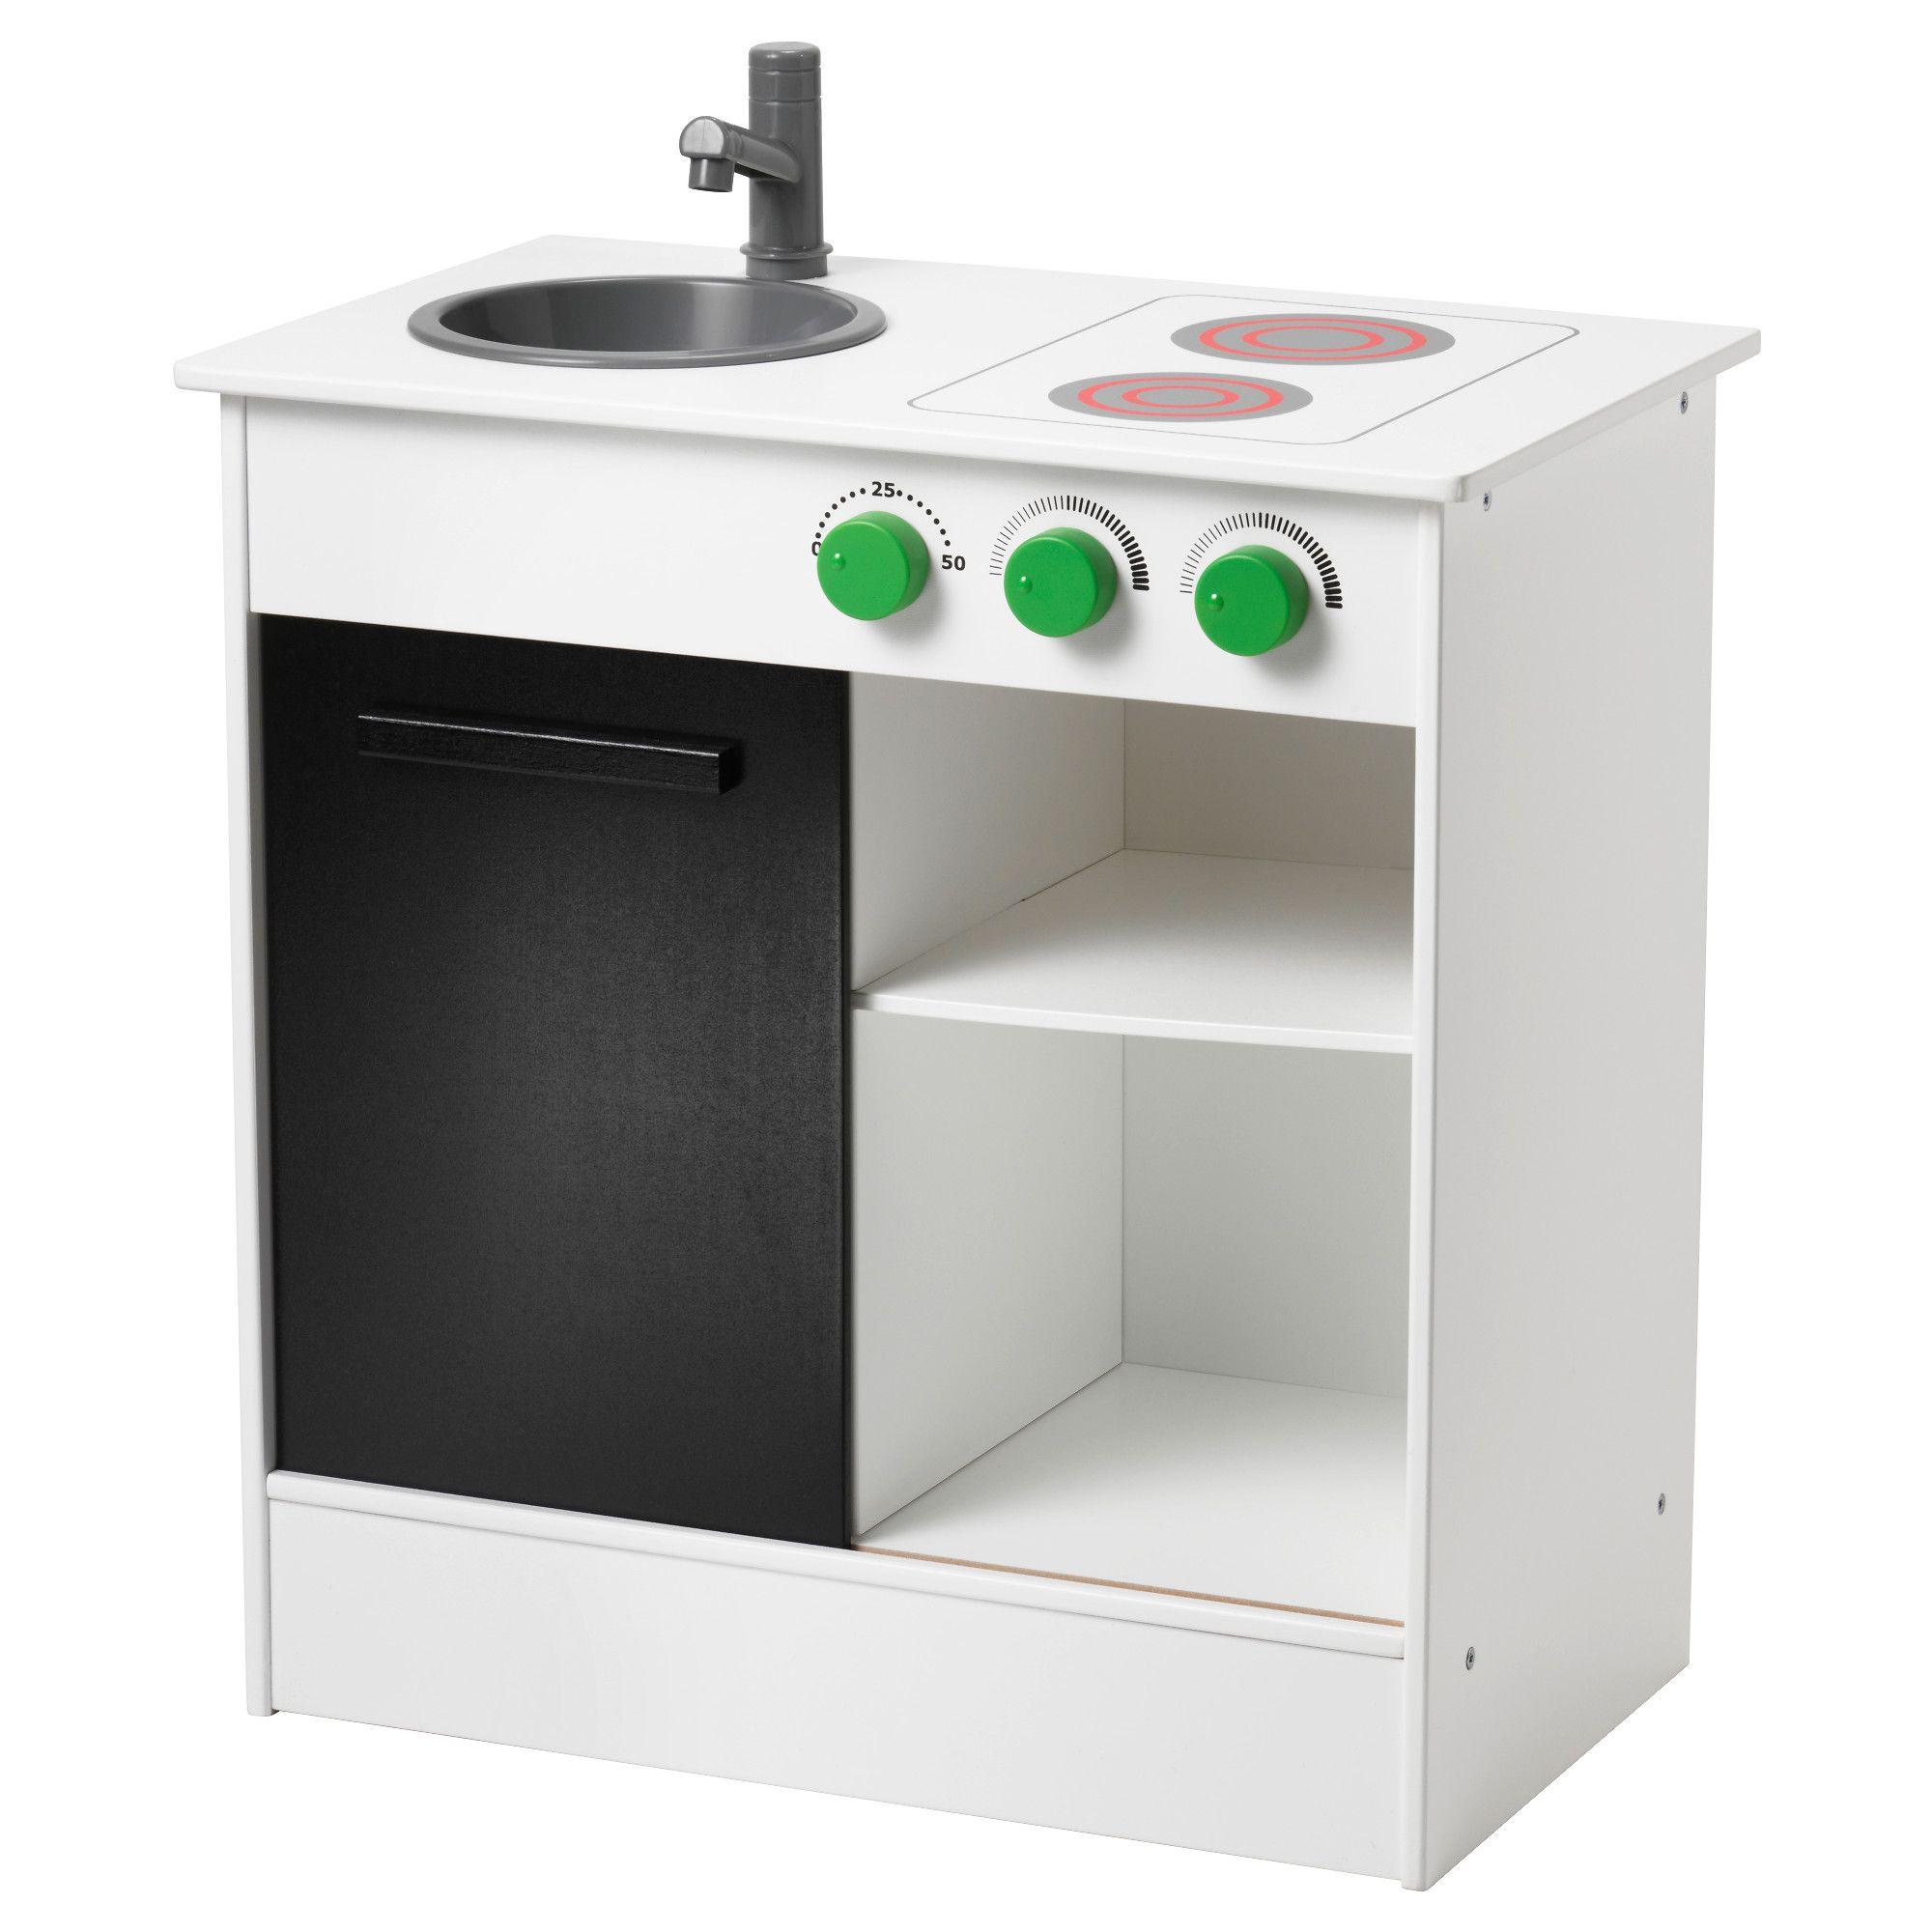 Wood Play Kitchen White nybakad play kitchen, white | mini kitchen, sliding door and